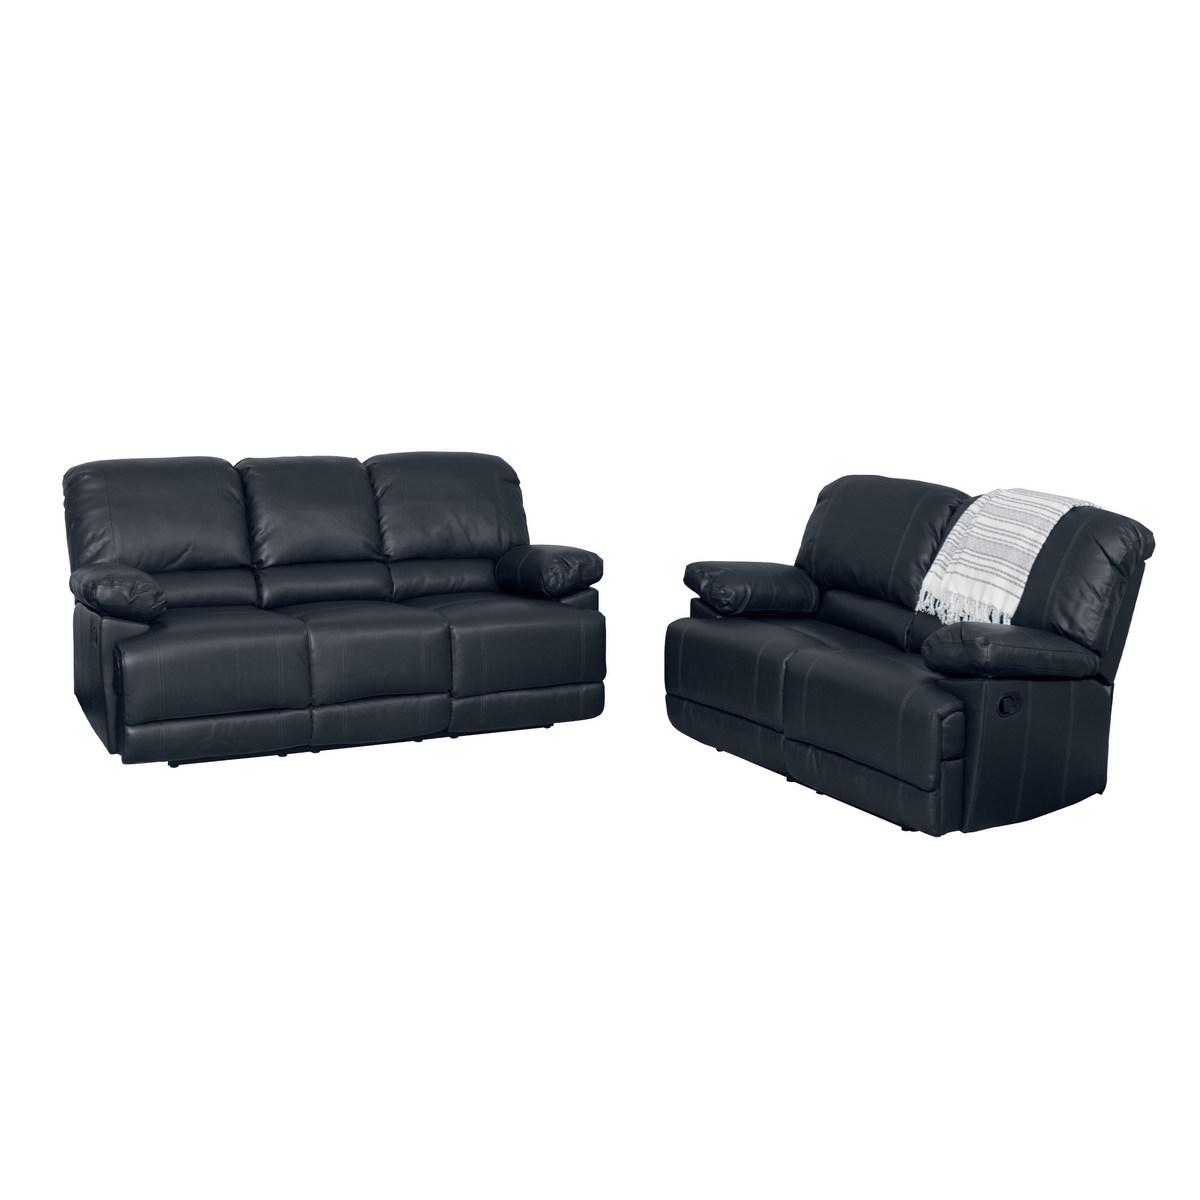 Corliving Black Bonded Leather Reclining Sofa Set